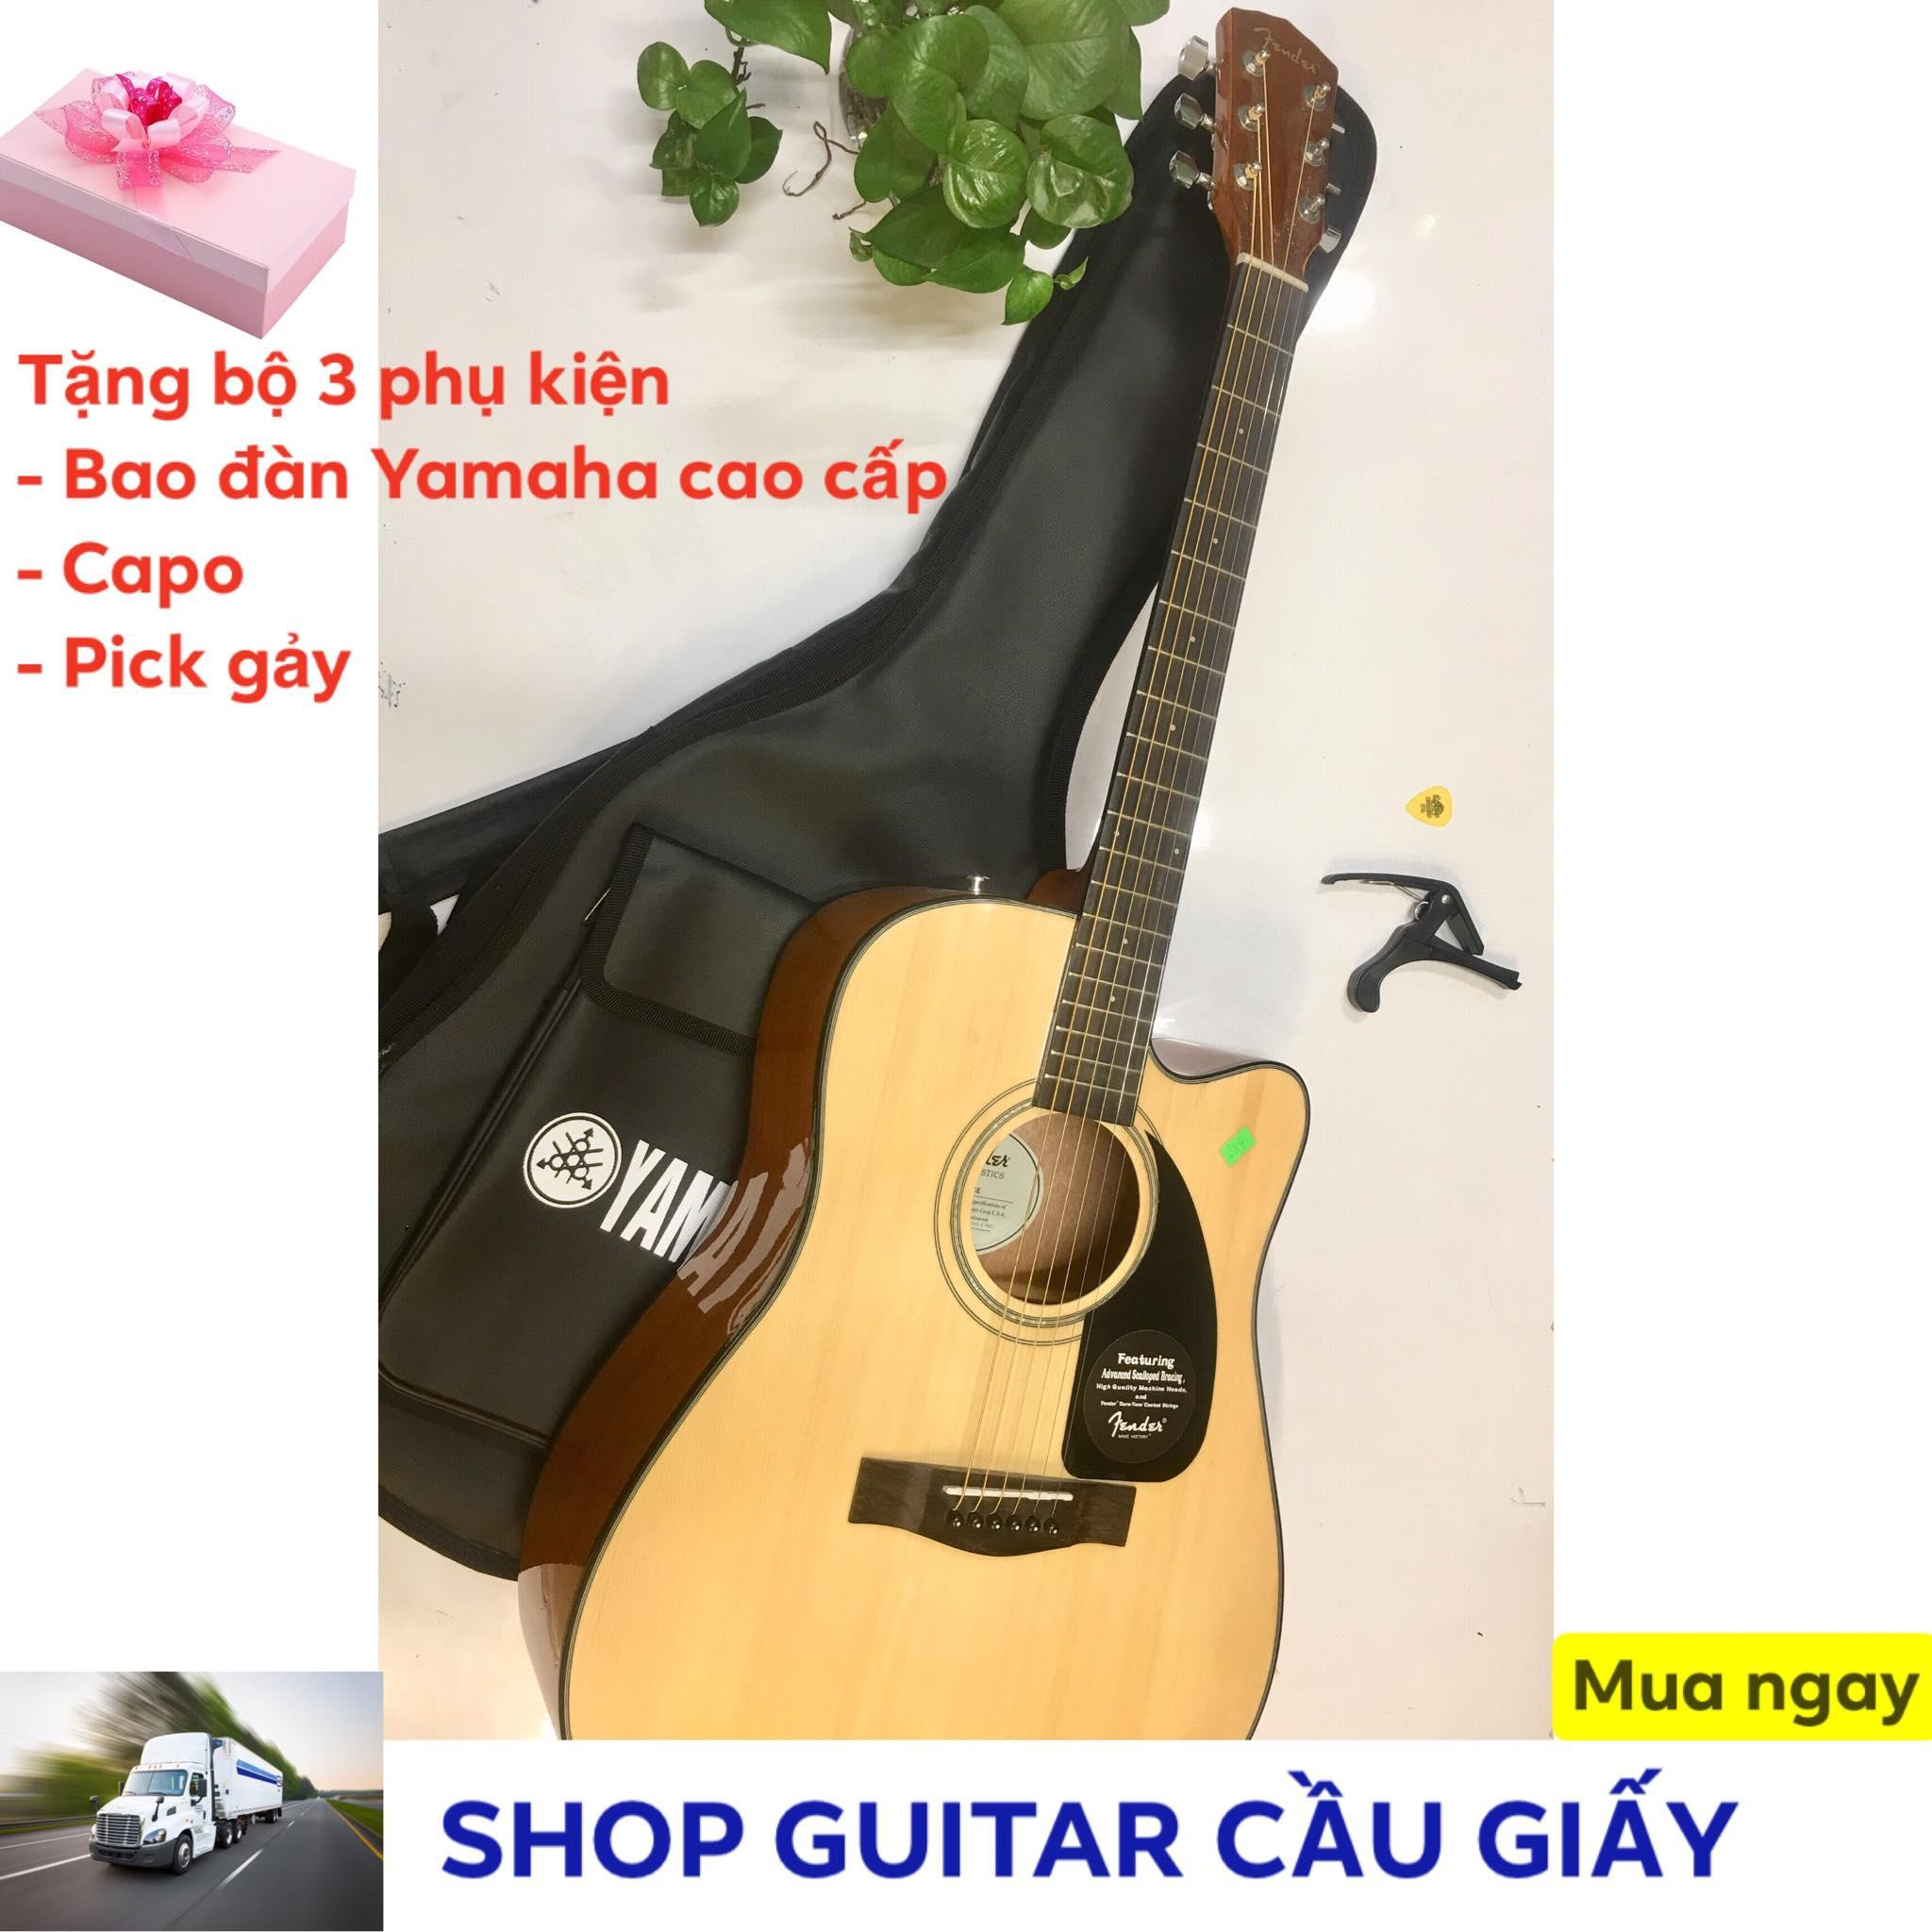 Đàn guitar Acoustic Fender + Tặng bao da Yamaha, capo, pick gảy